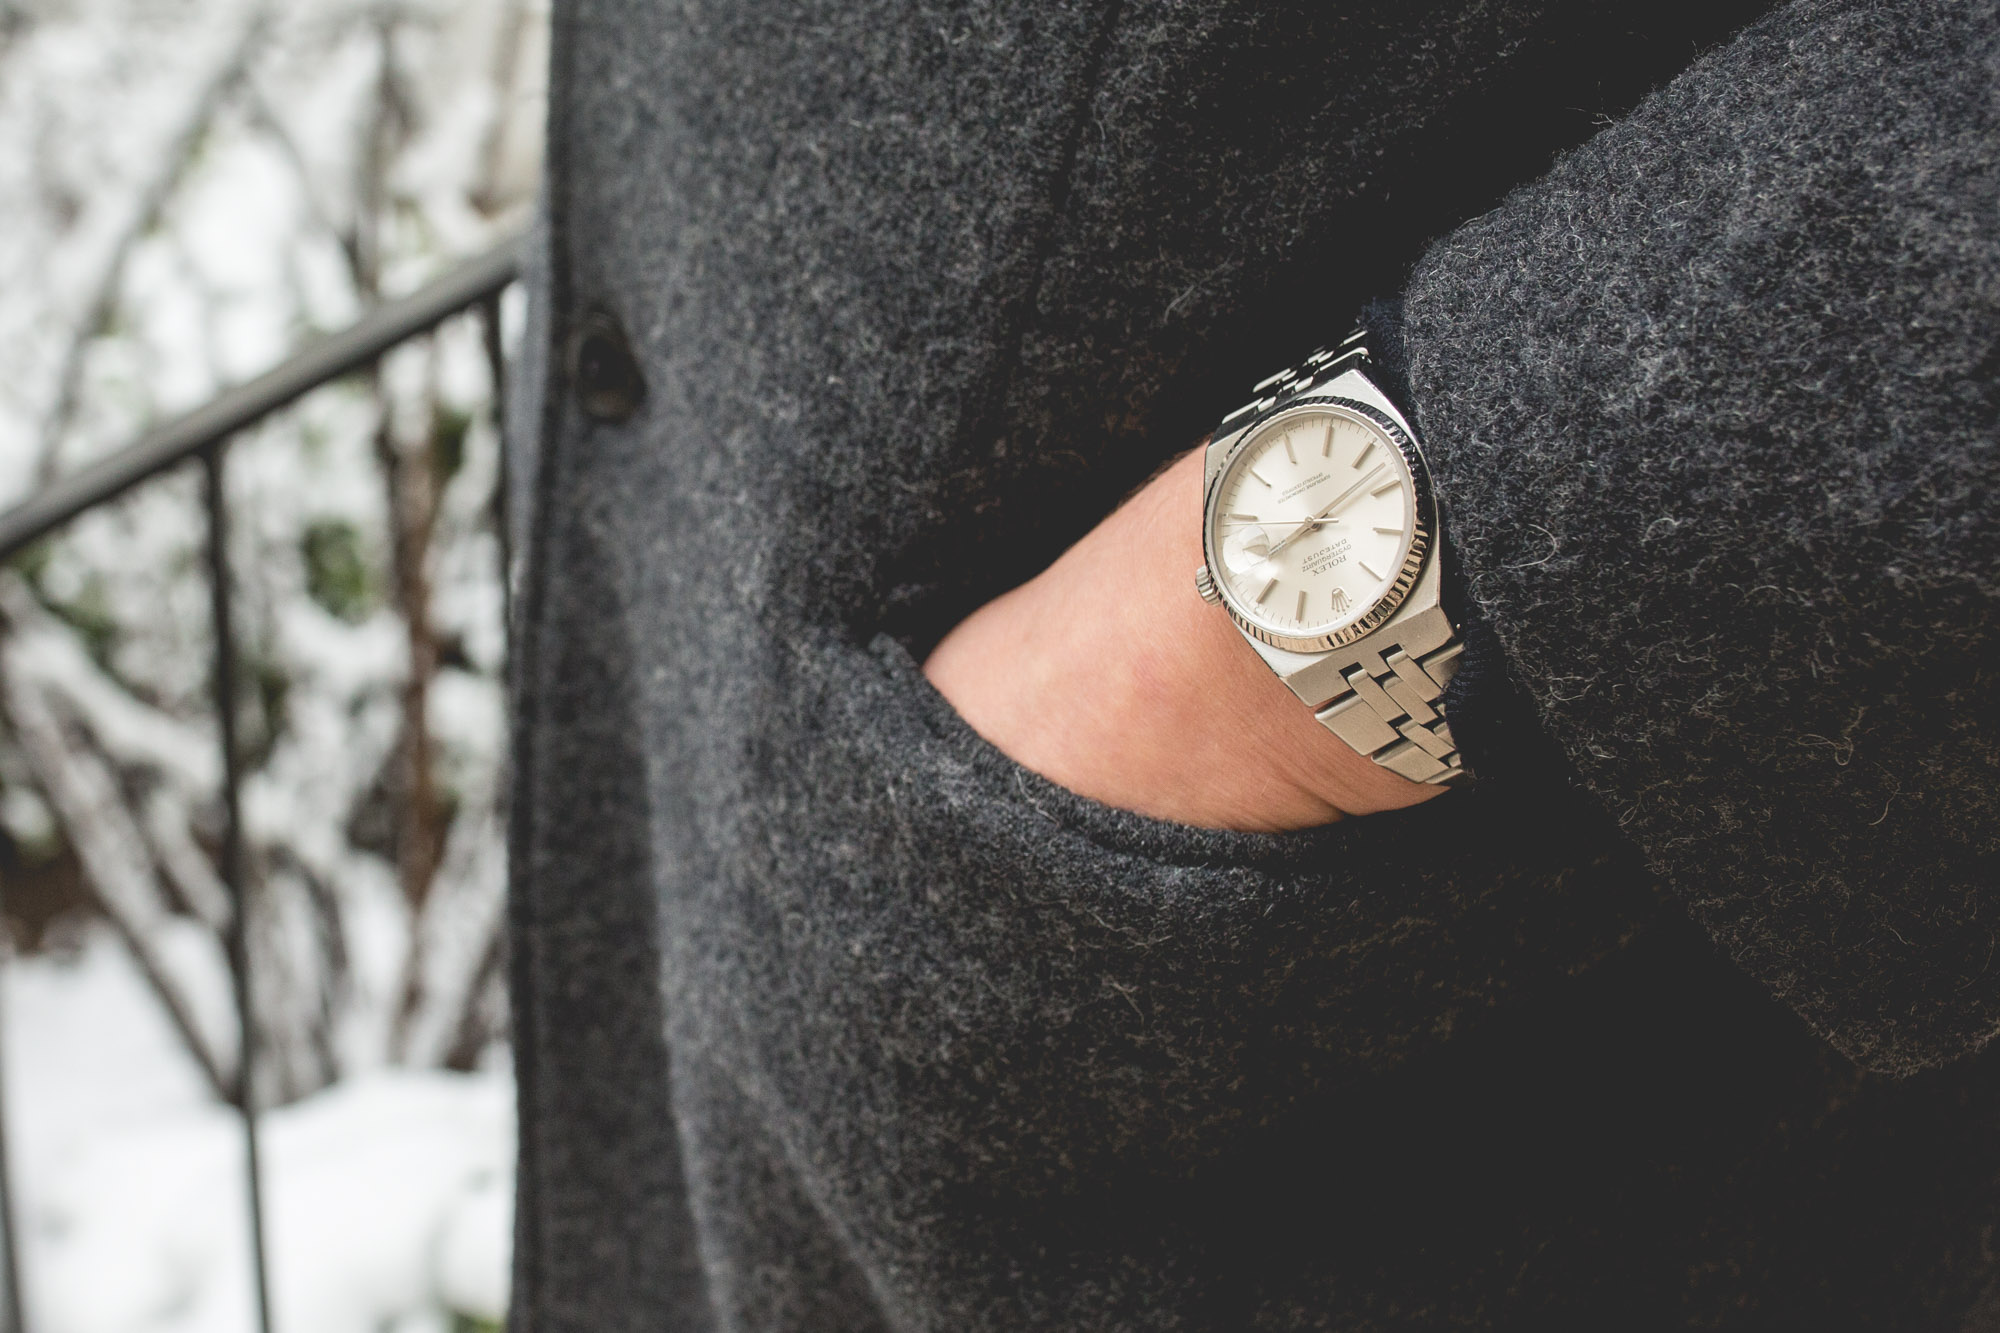 Rolex Oysterquartz - Datejust 17014 - poignet